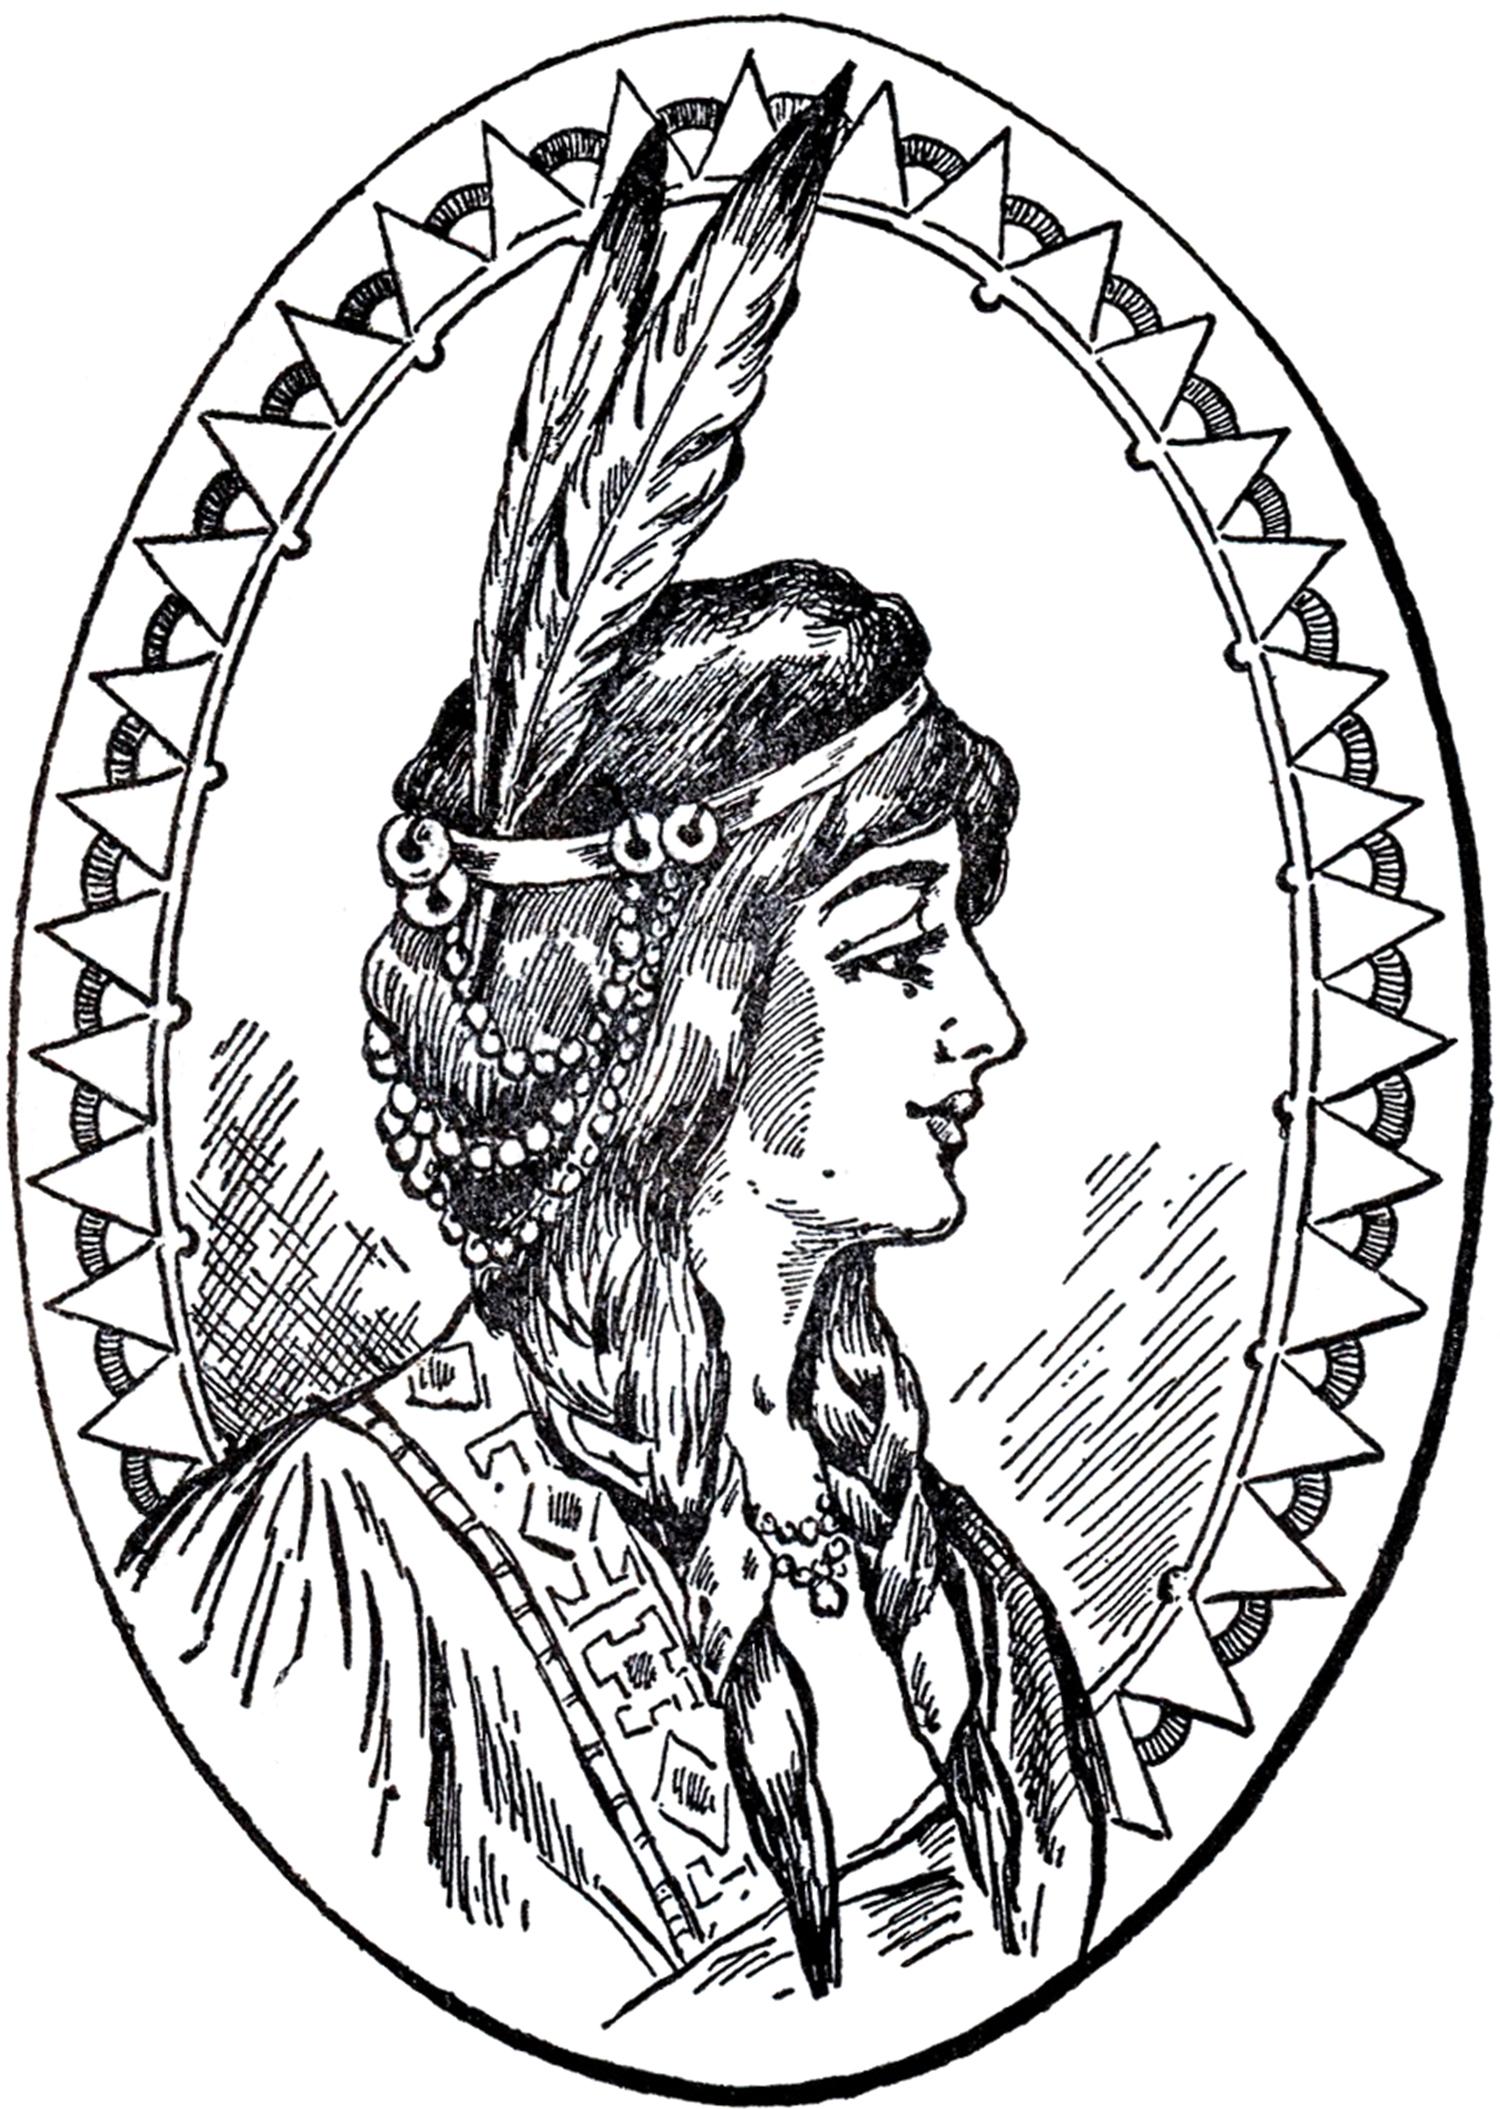 Native American Woman Clip Art - The Graphics Fairy